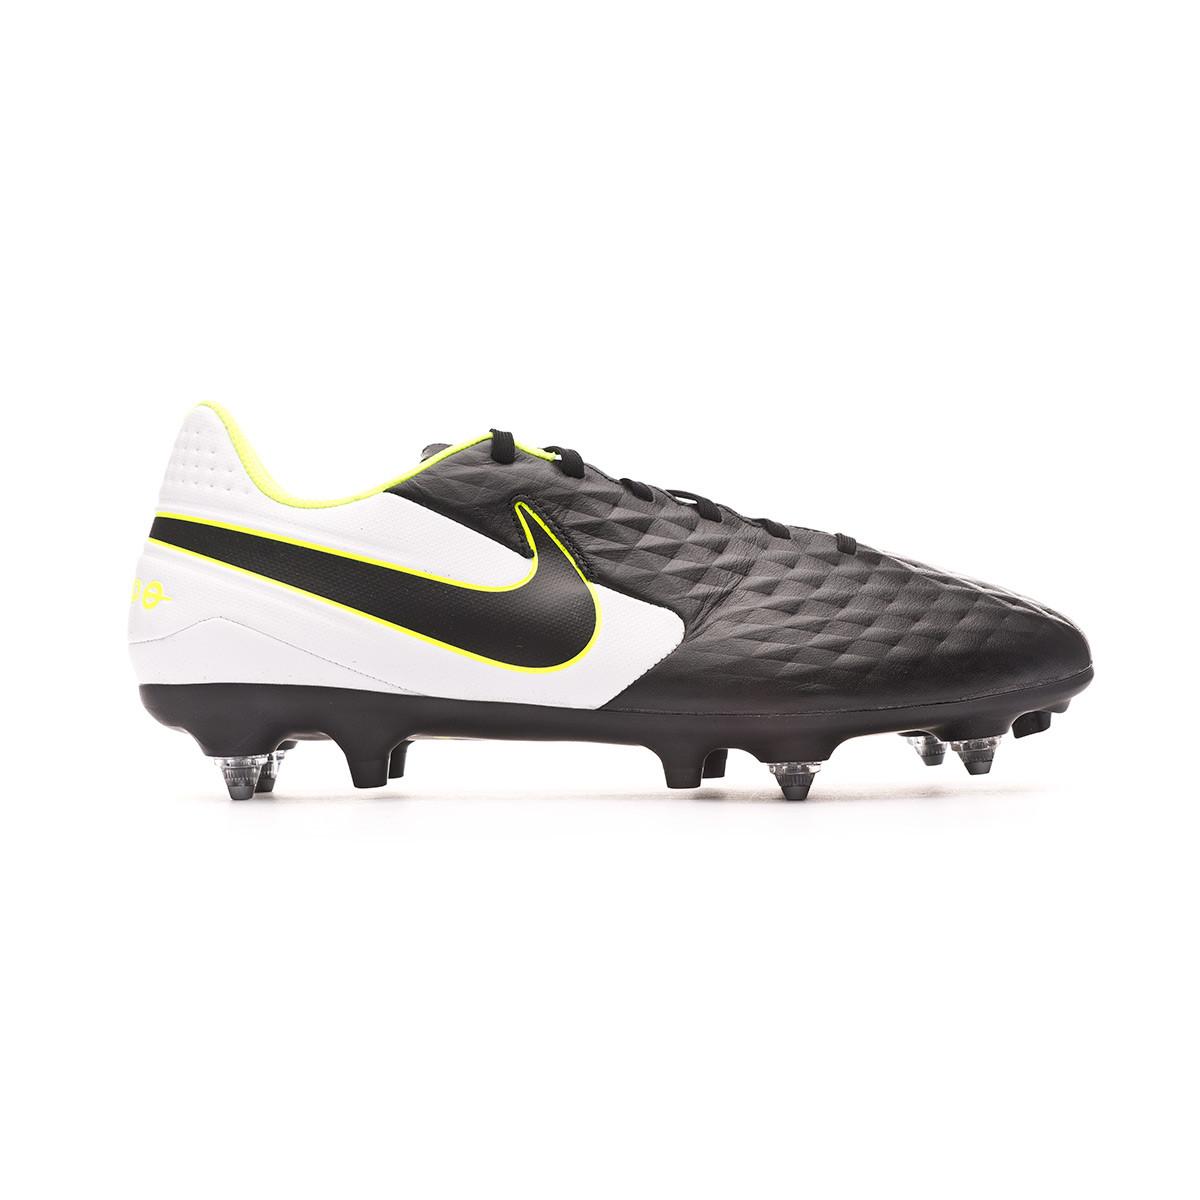 Chaussure de foot Nike Tiempo Legend VIII Academy SG PRO Anti Clog Traction